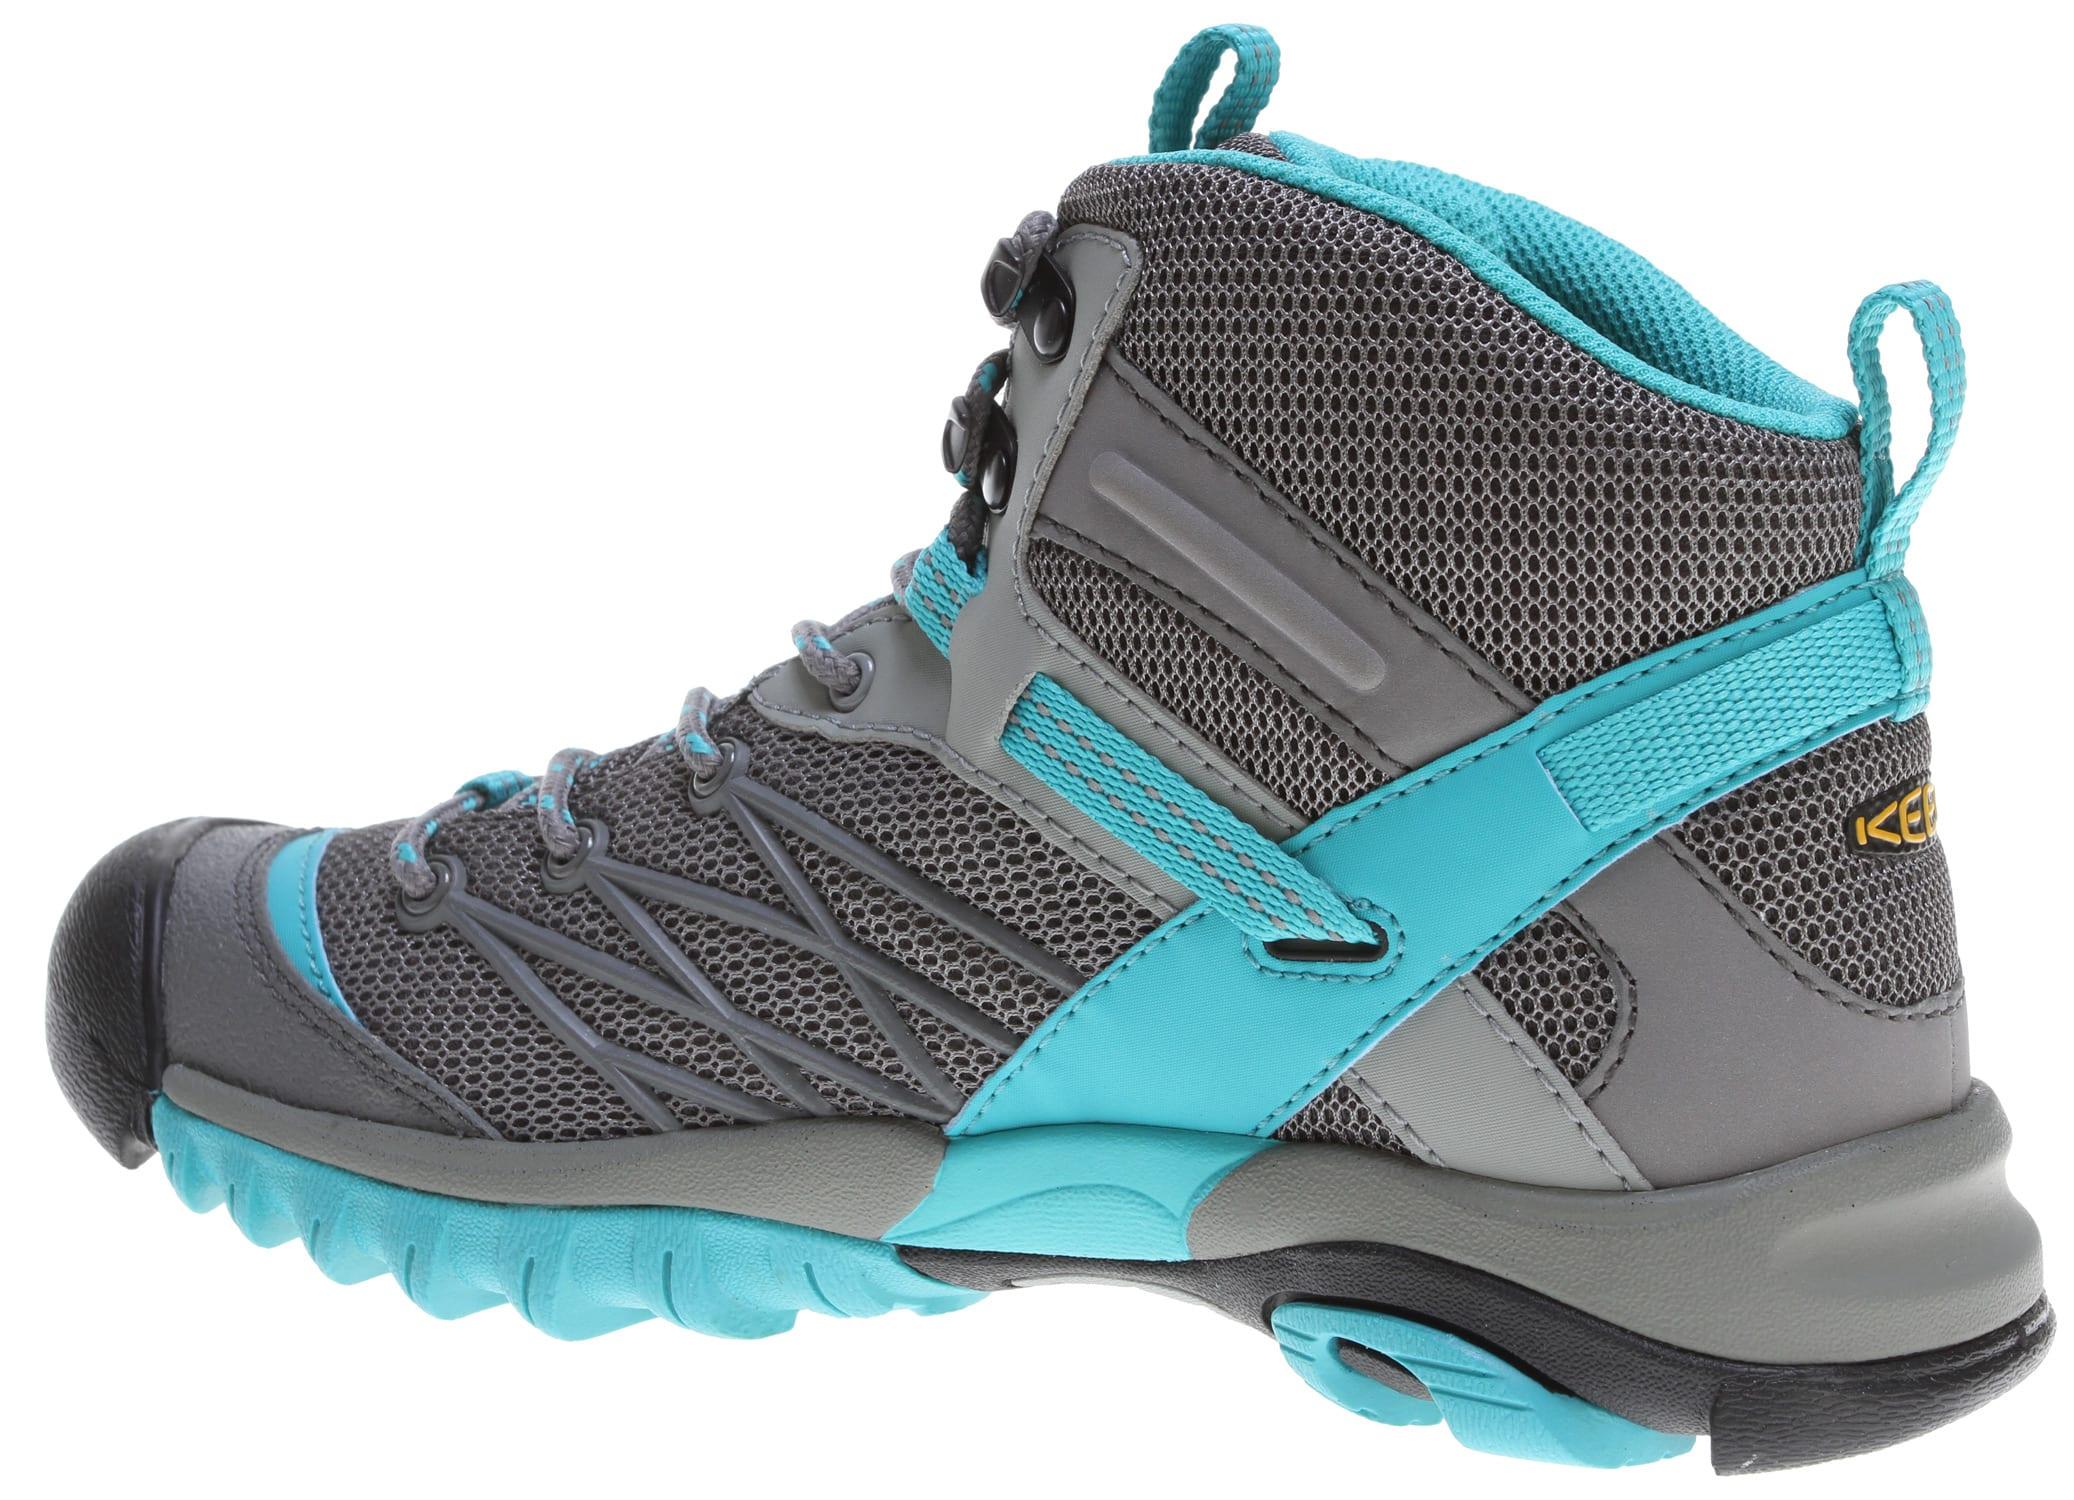 Beautiful Keen Voyageur Womenu0026#39;s Mid Hiking Boots Brindle Custard - Family Footwear Center